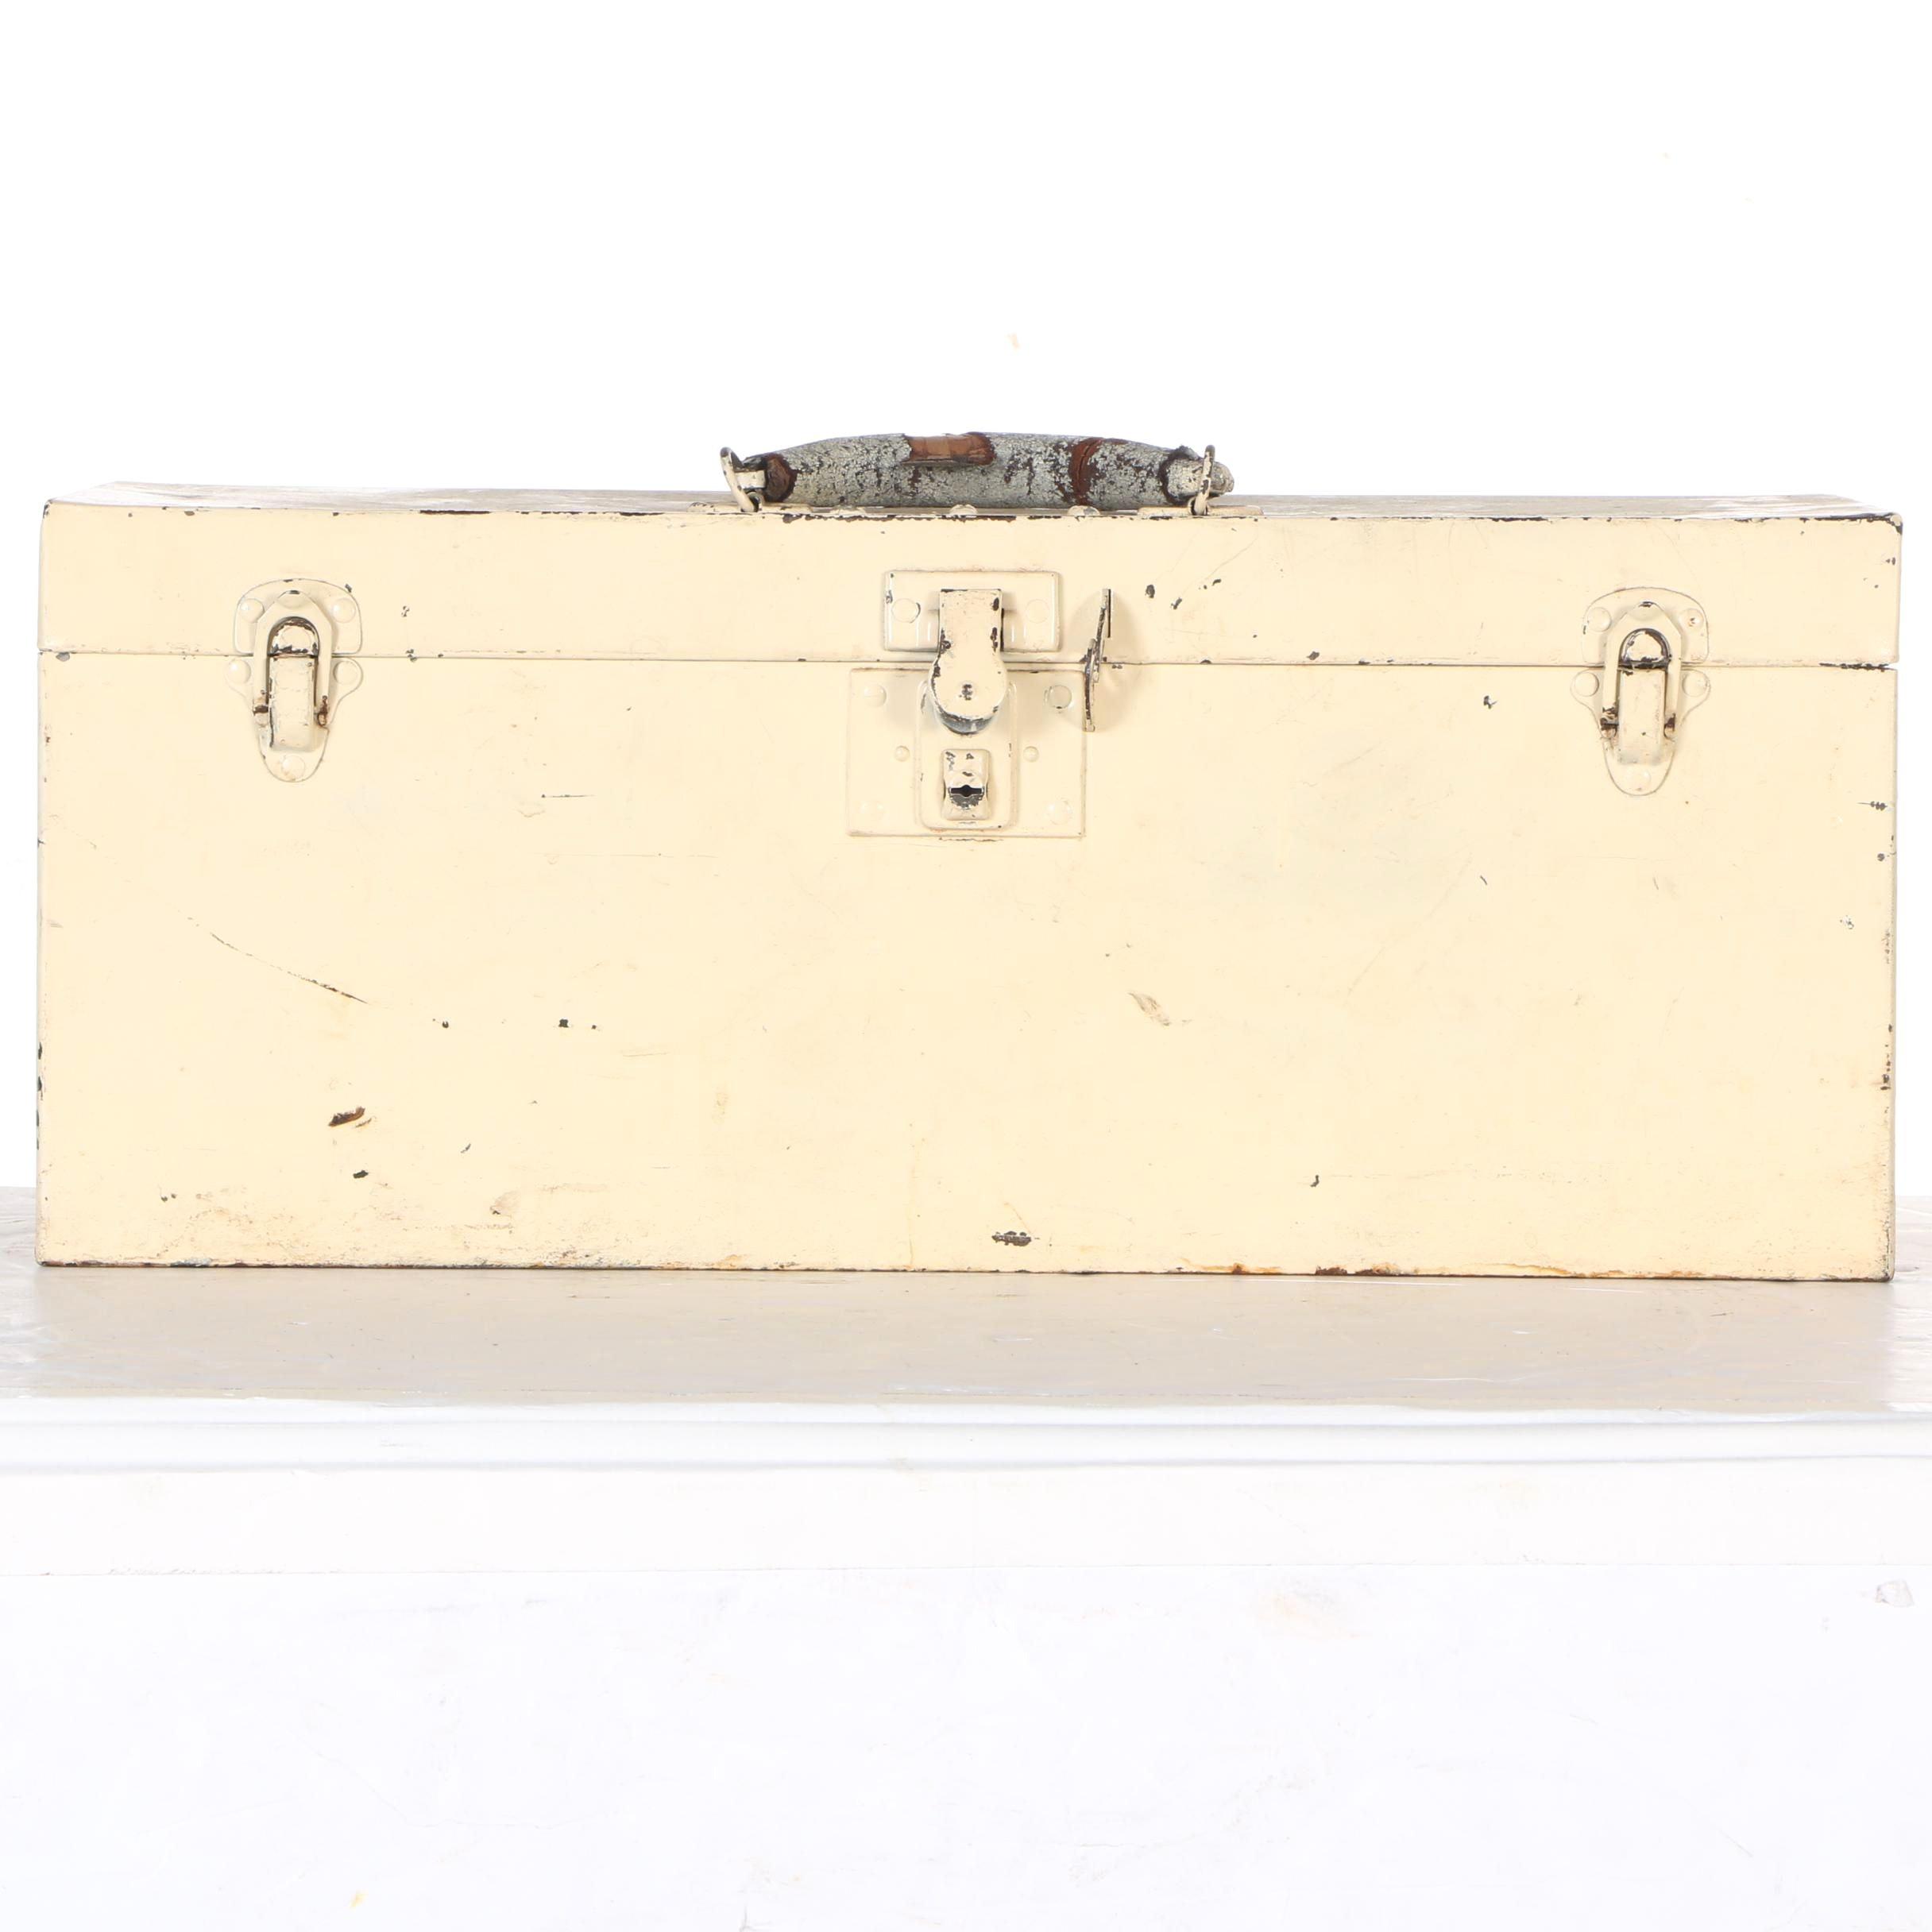 Vintage Metal Toolbox with Hand Tools